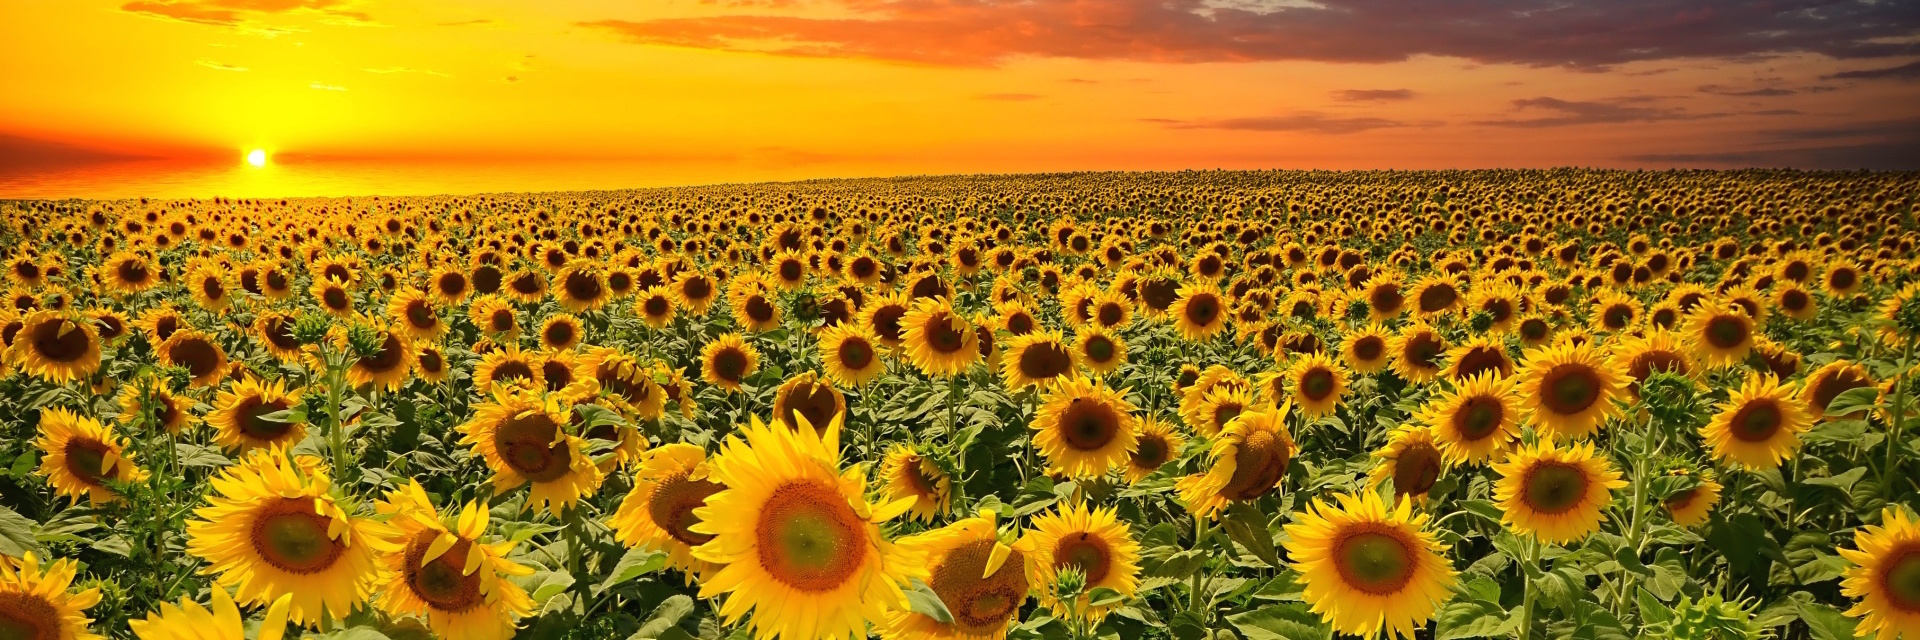 tsvety_tsvetenie_field_flowers-2